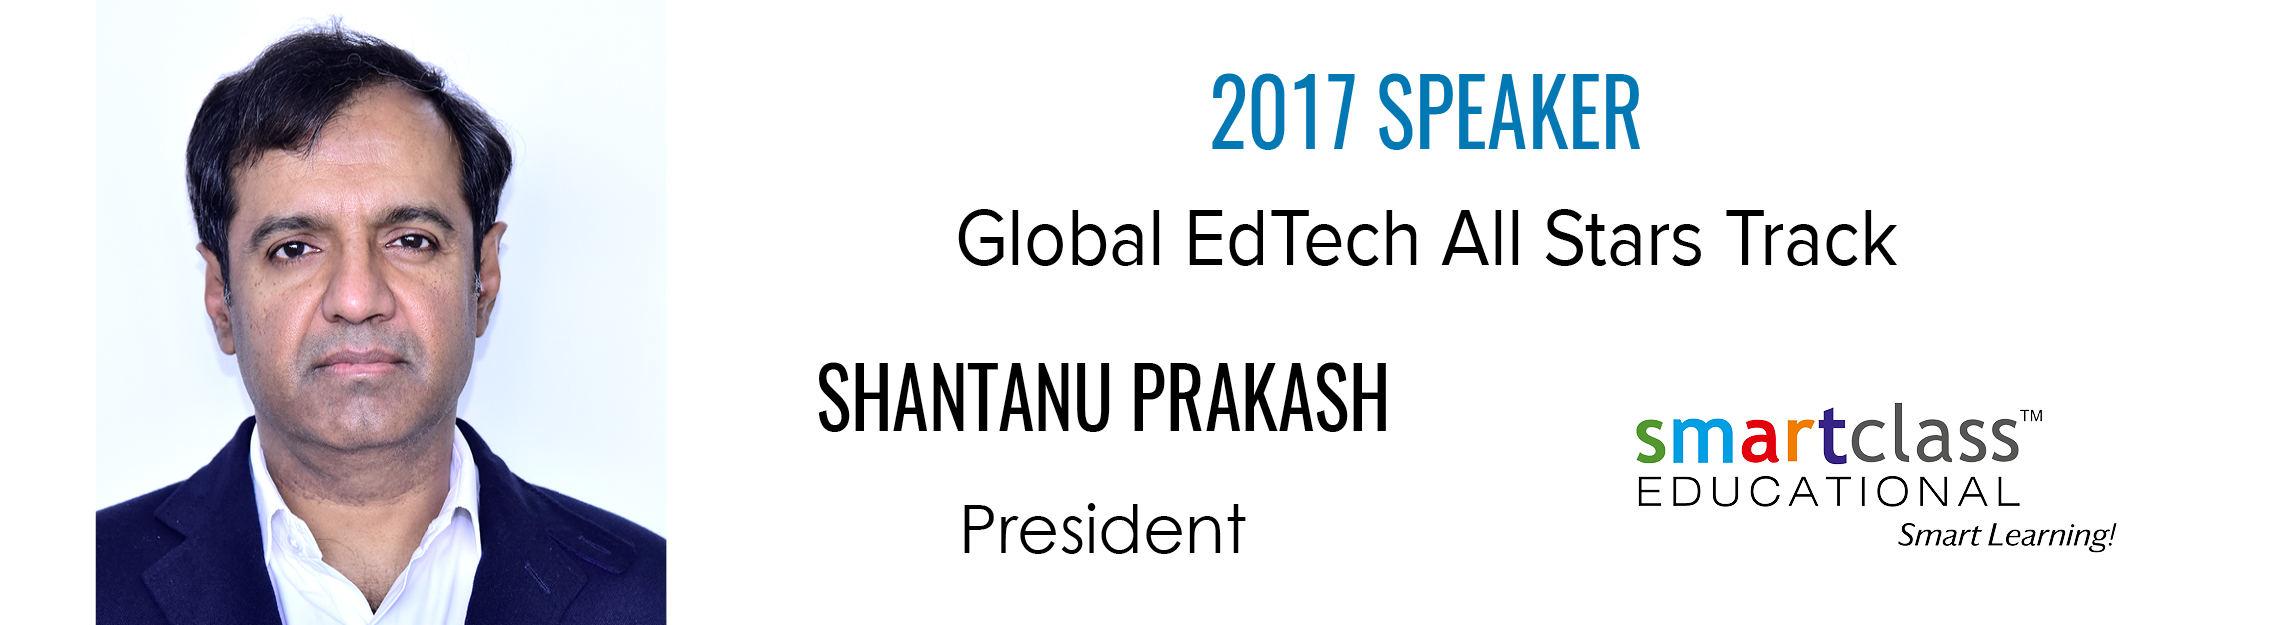 ShantanuPrakash_SmartClassEducational-1.png